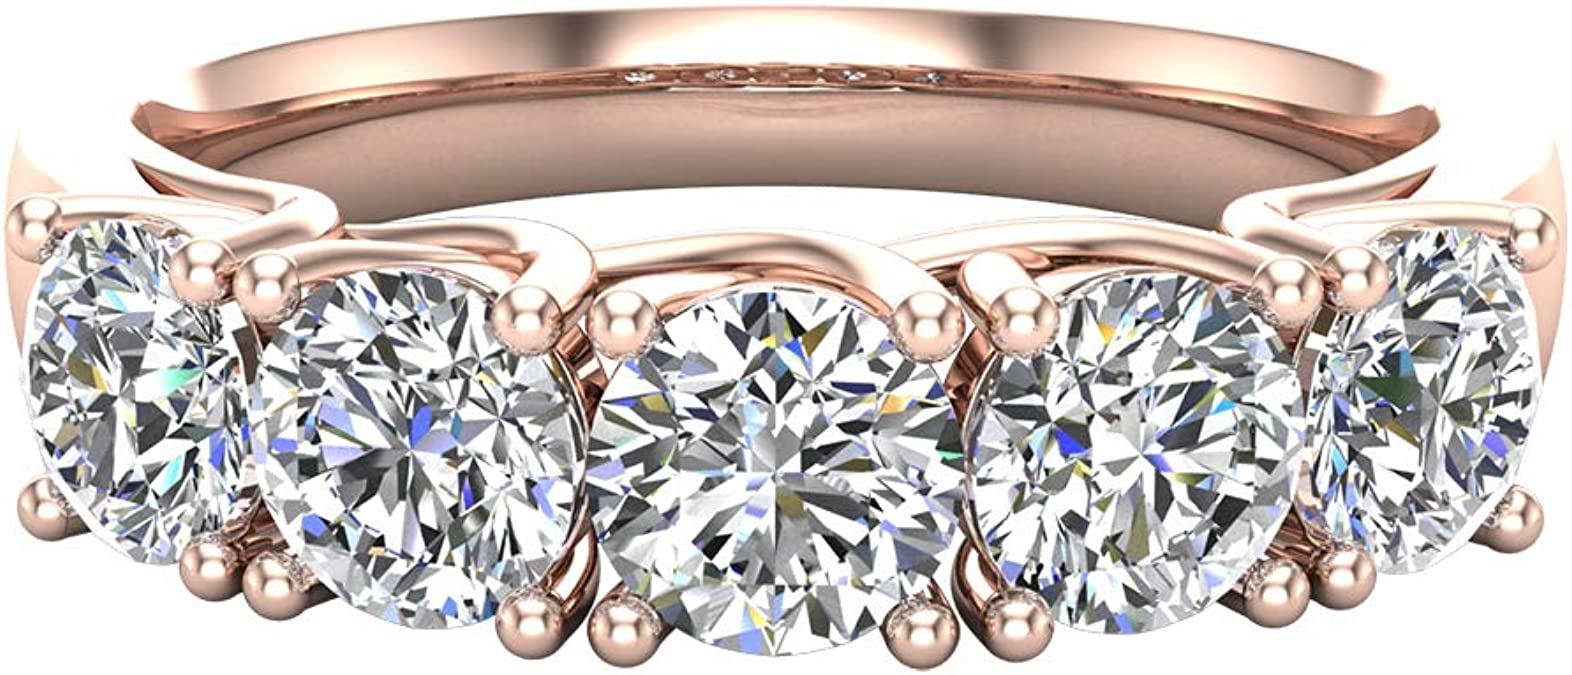 TONYS JEWELRY CO Sterling Silver .05 CTW Mystara Diamonds/Â Heart Pendant